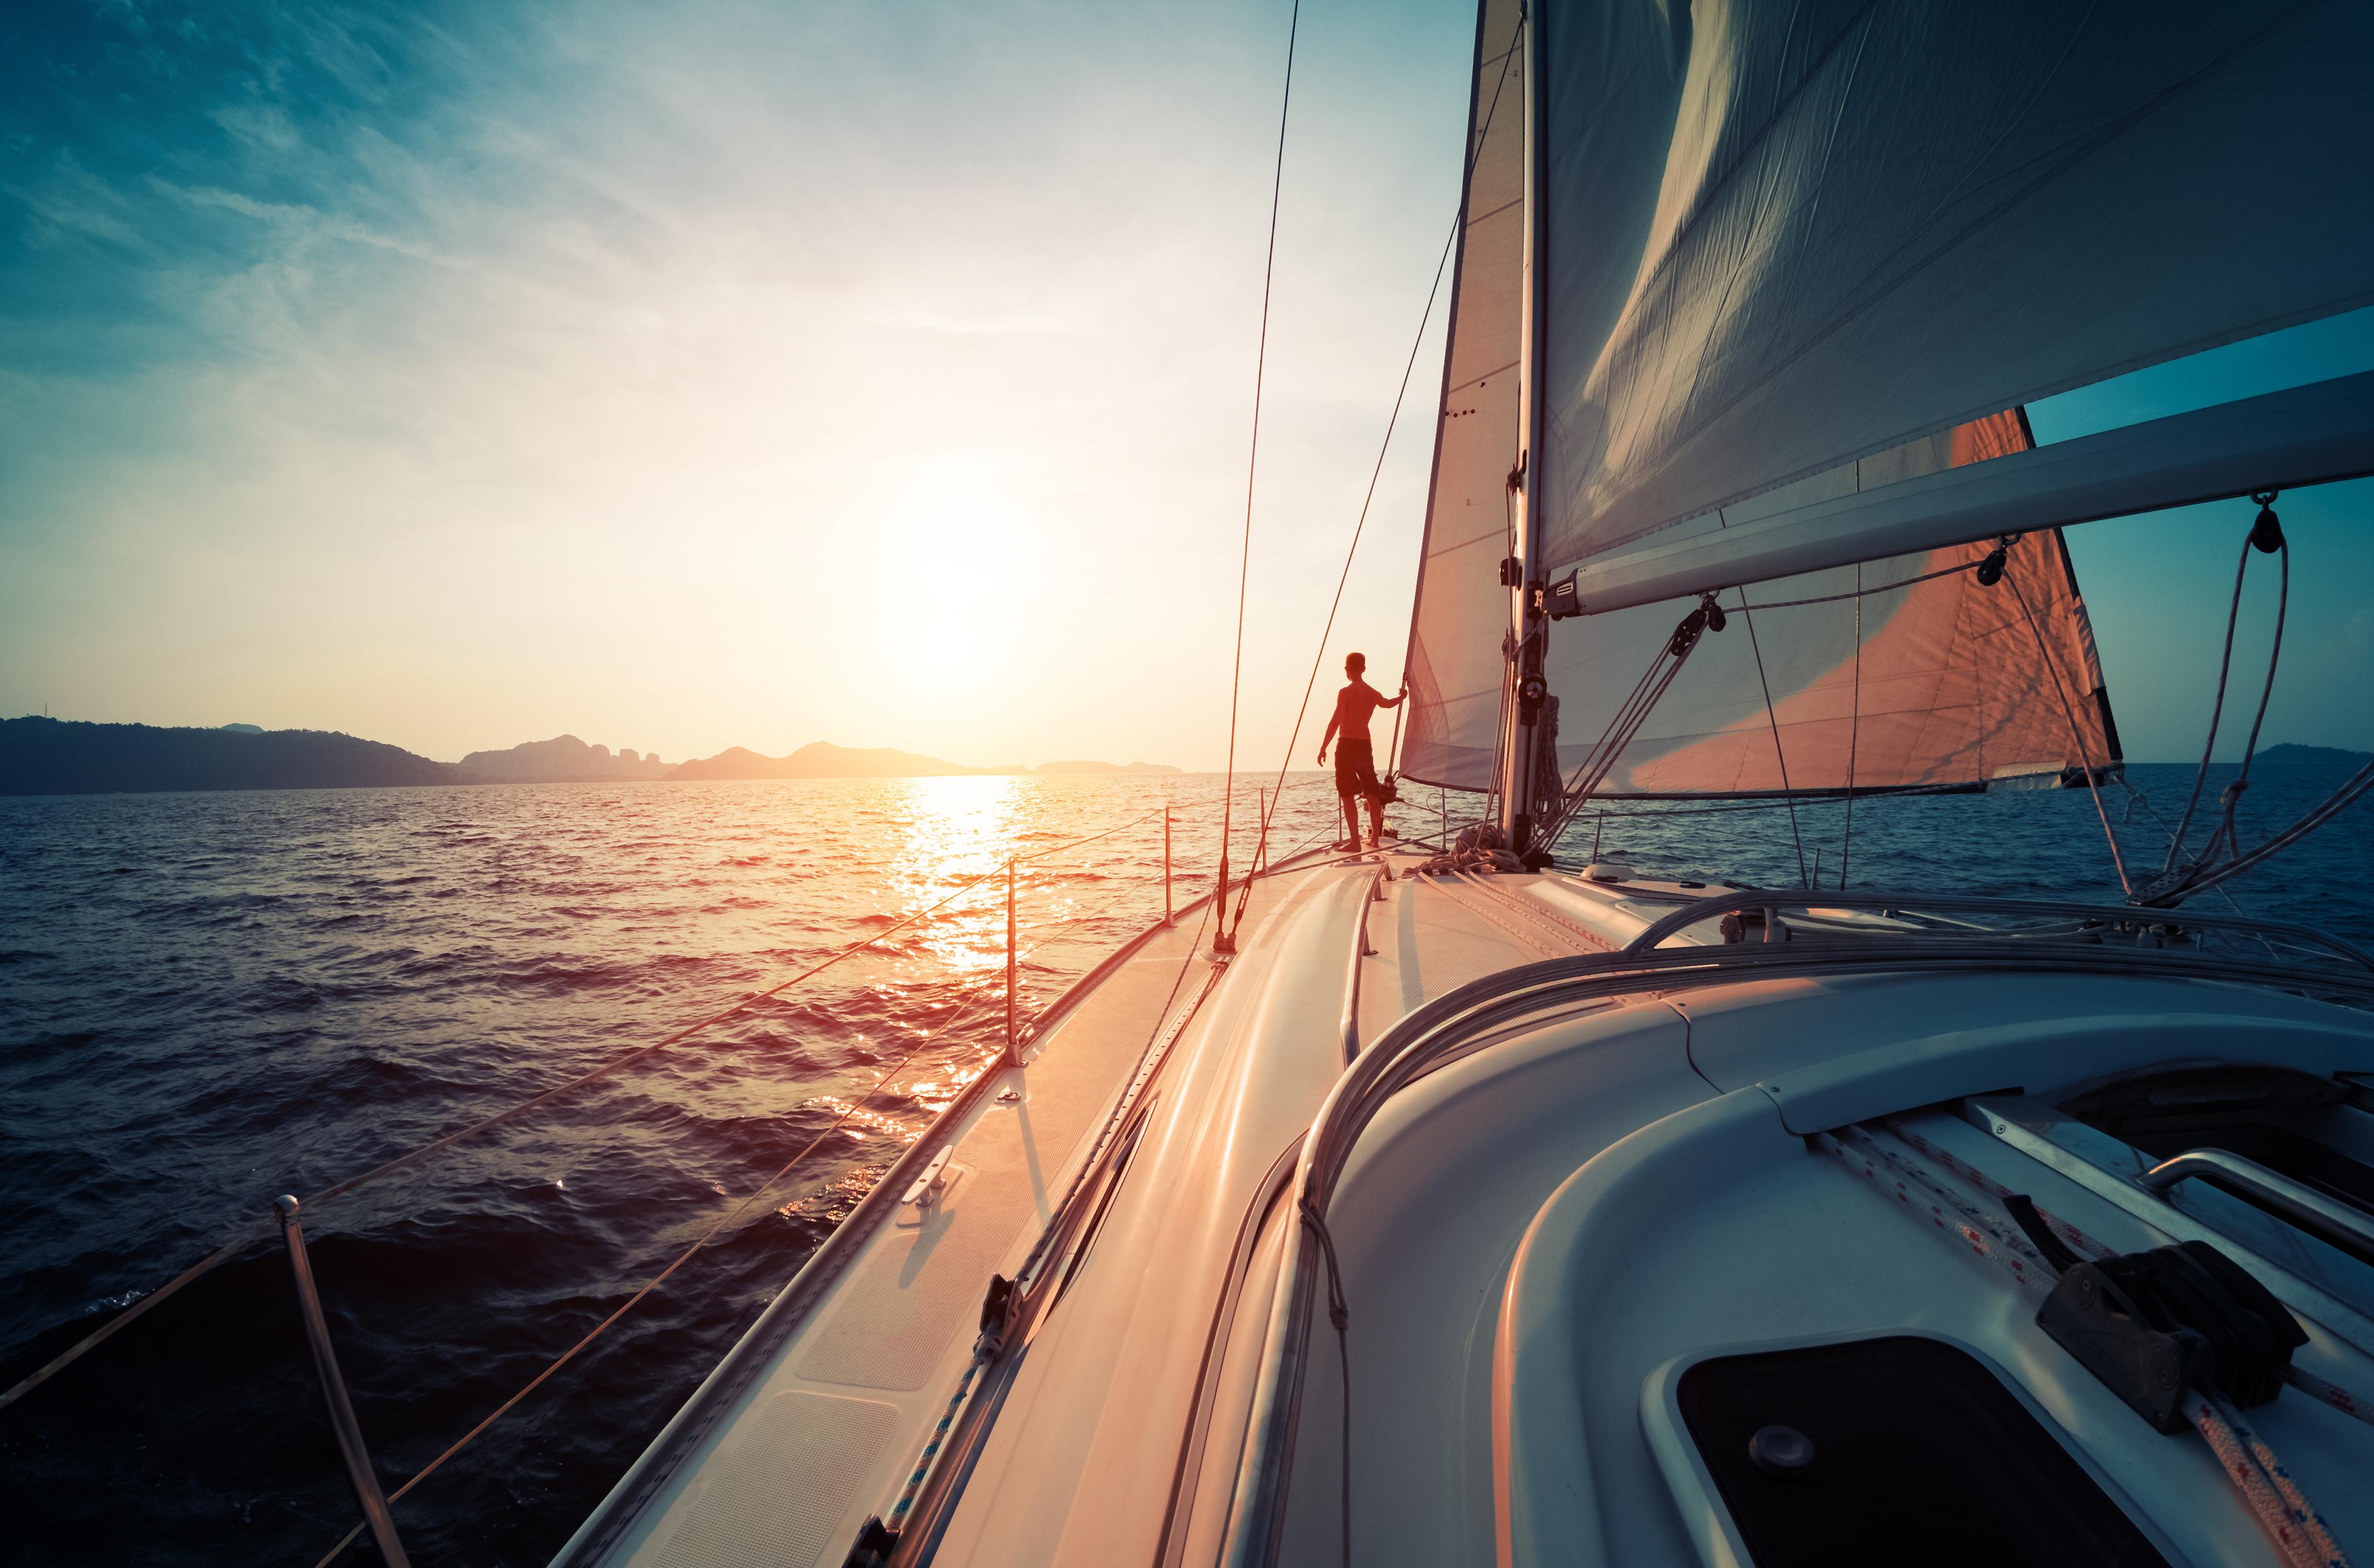 A sailboat pointing toward the sun